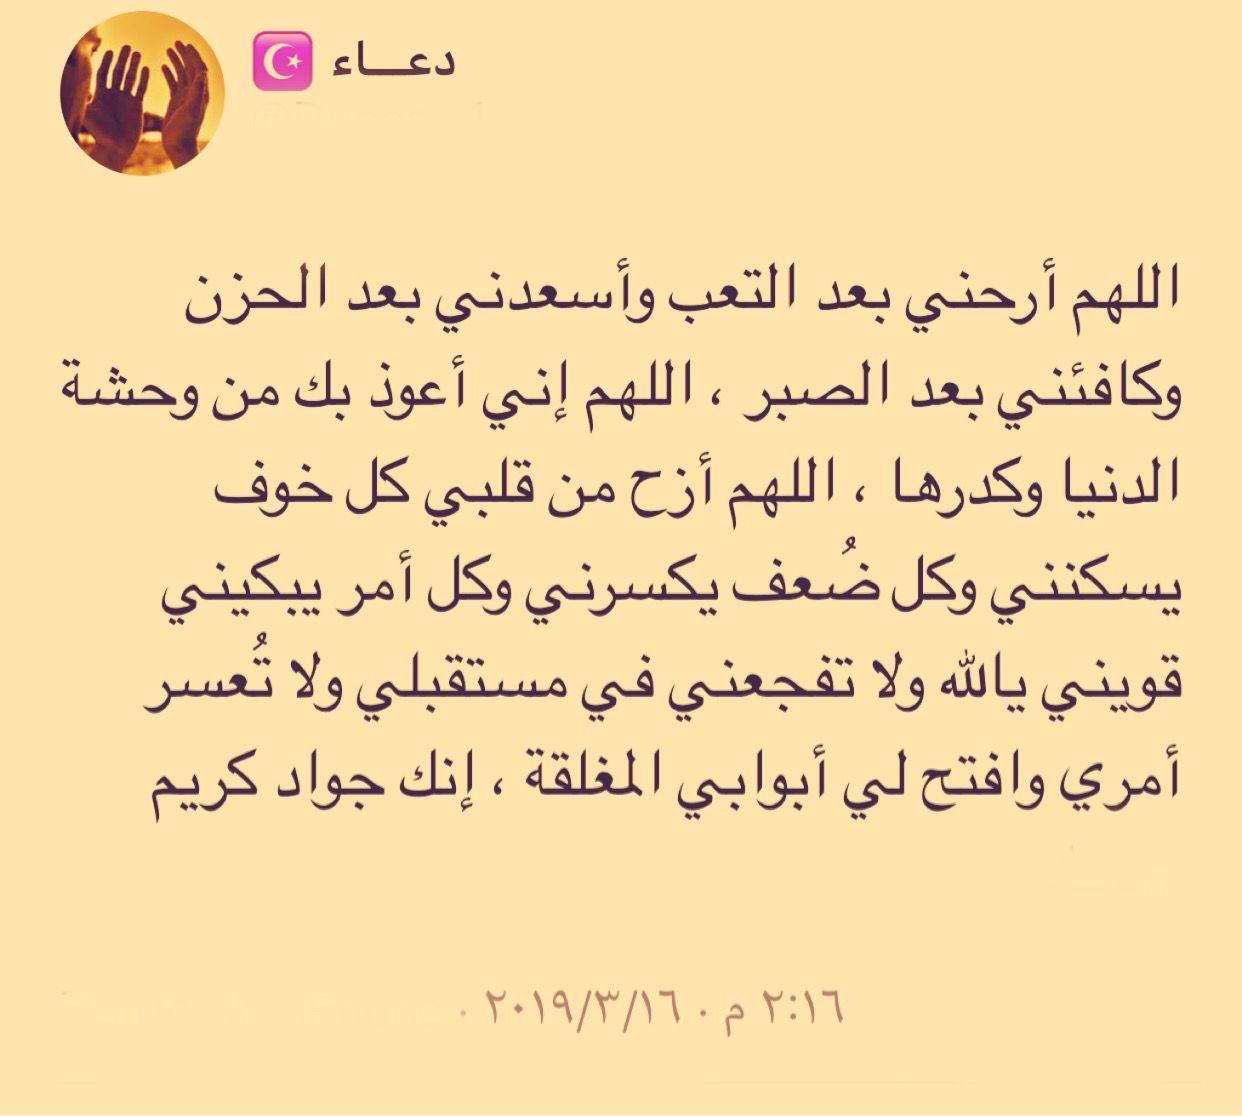 Pin By Maysoon On الدعاء باب السماء Calligraphy Arabic Calligraphy Arabic